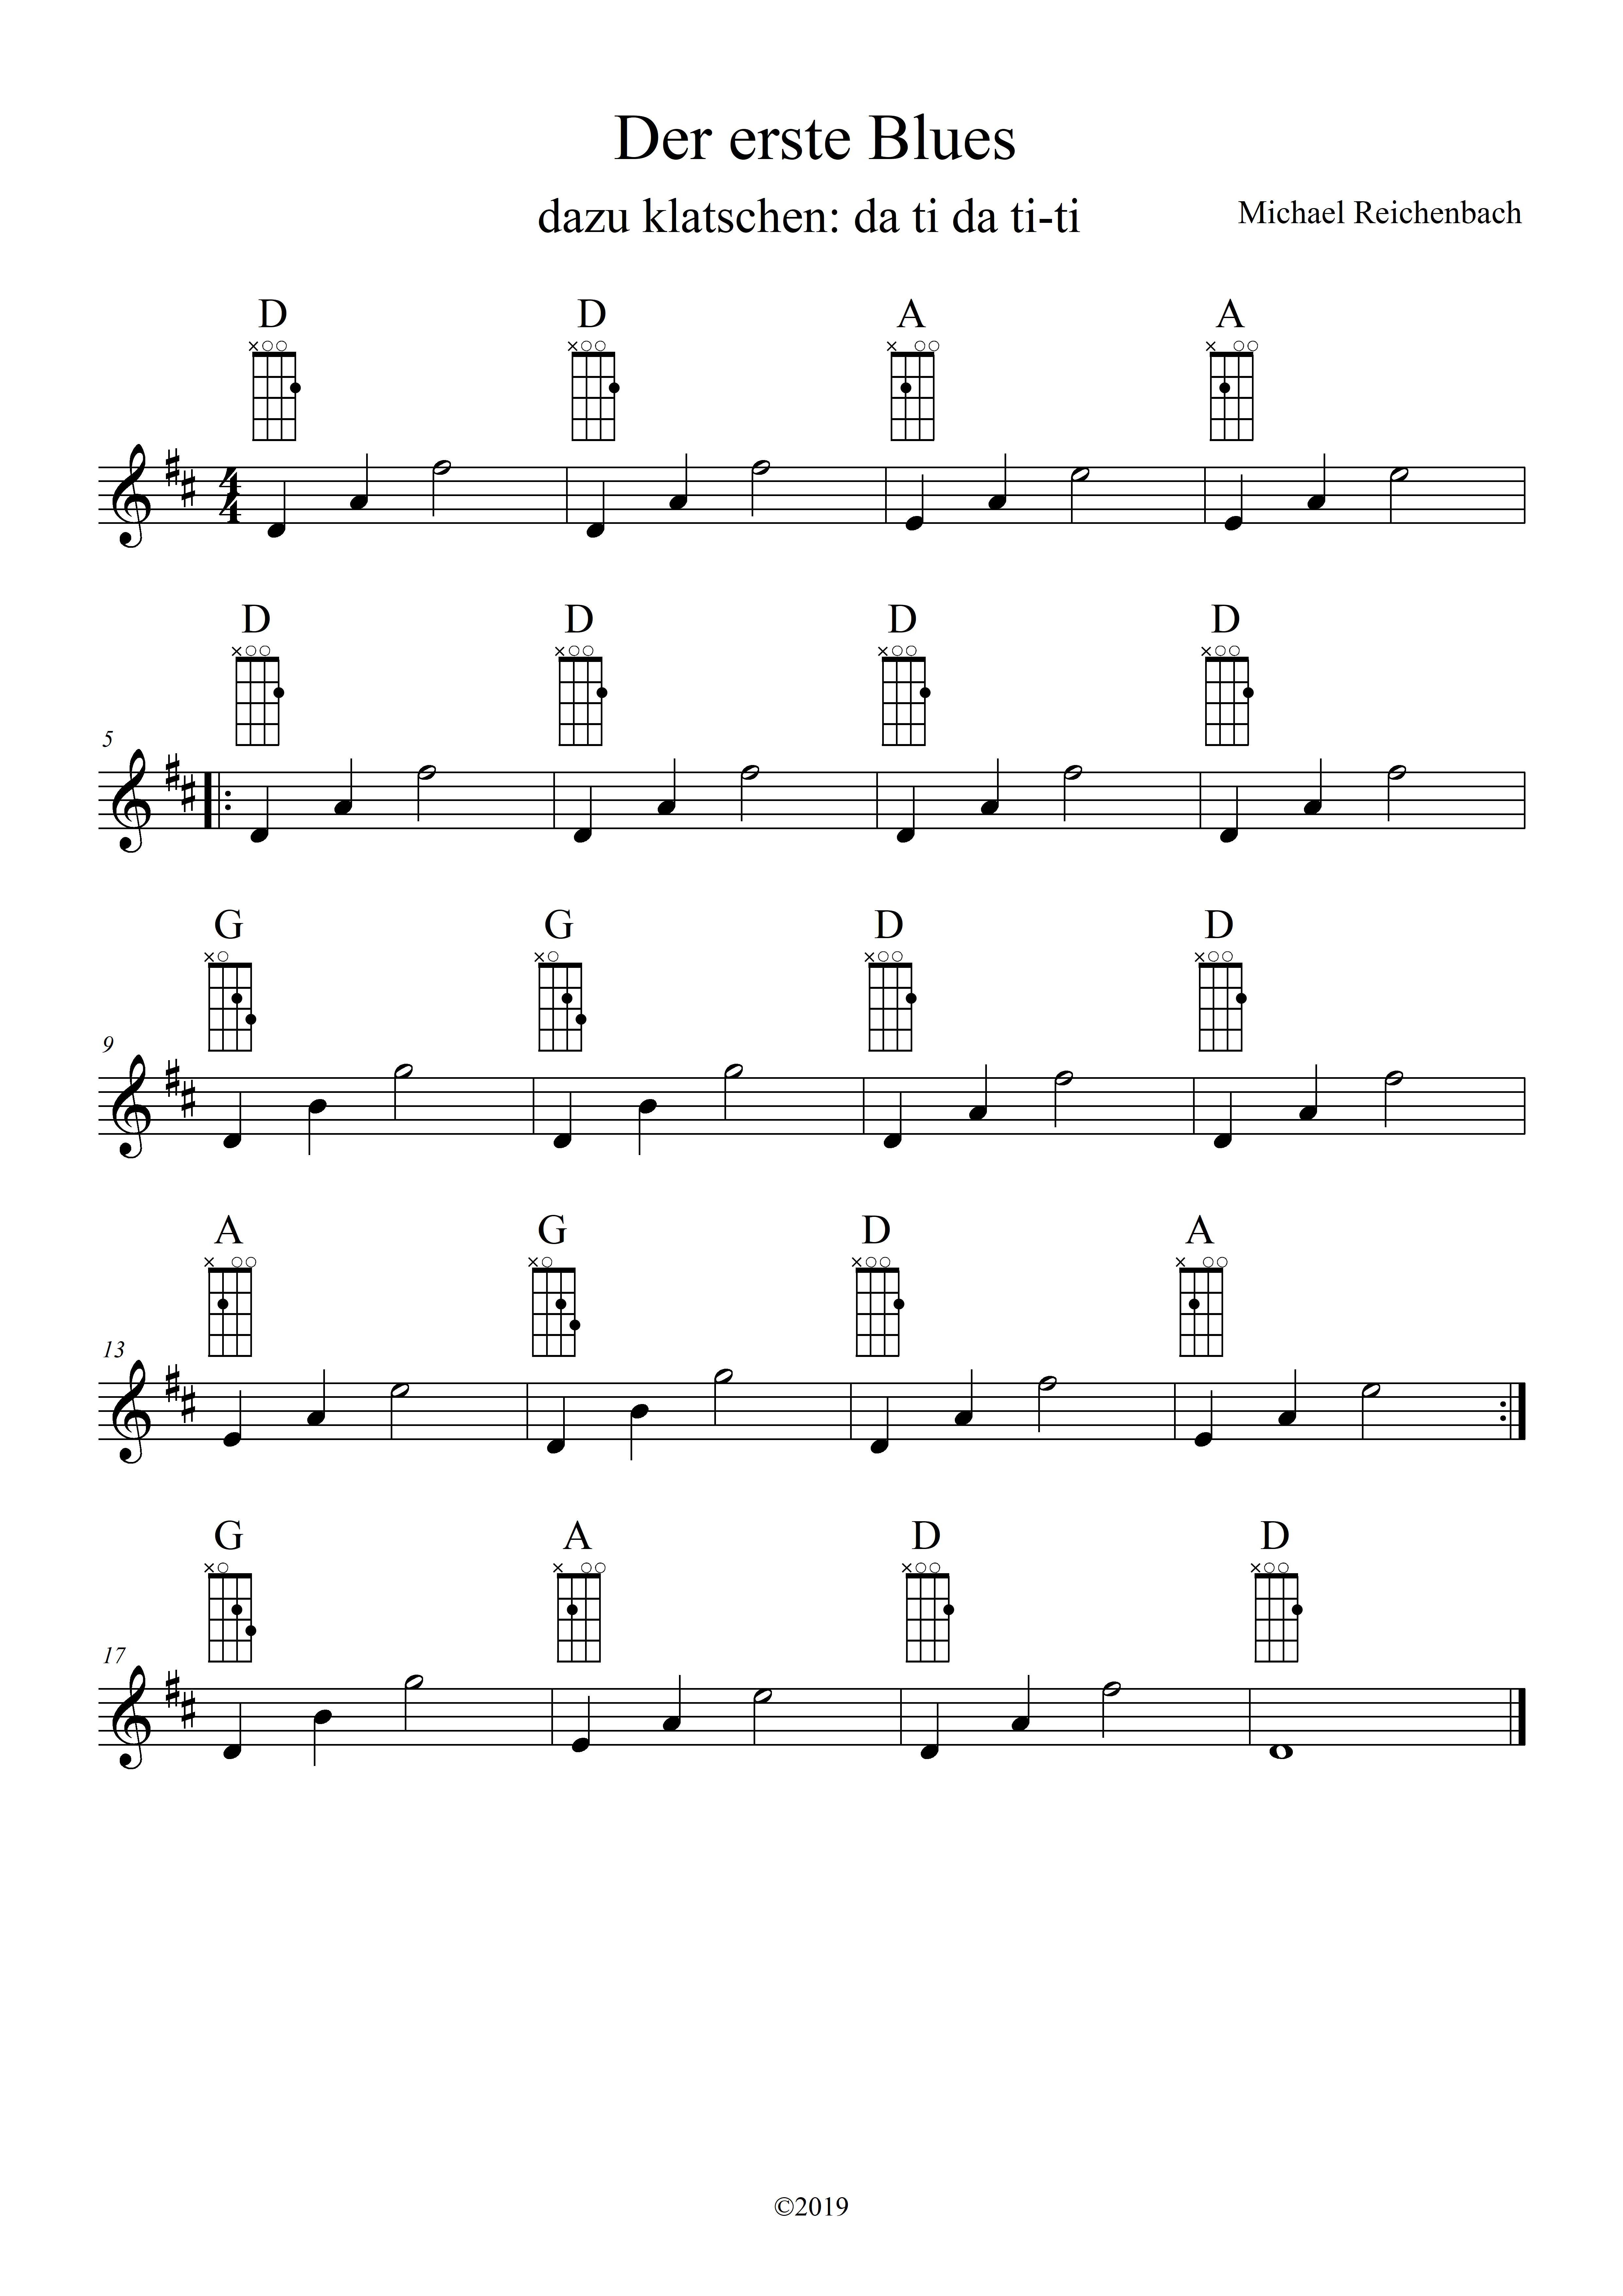 Mandoline lernen - Der erste Blues